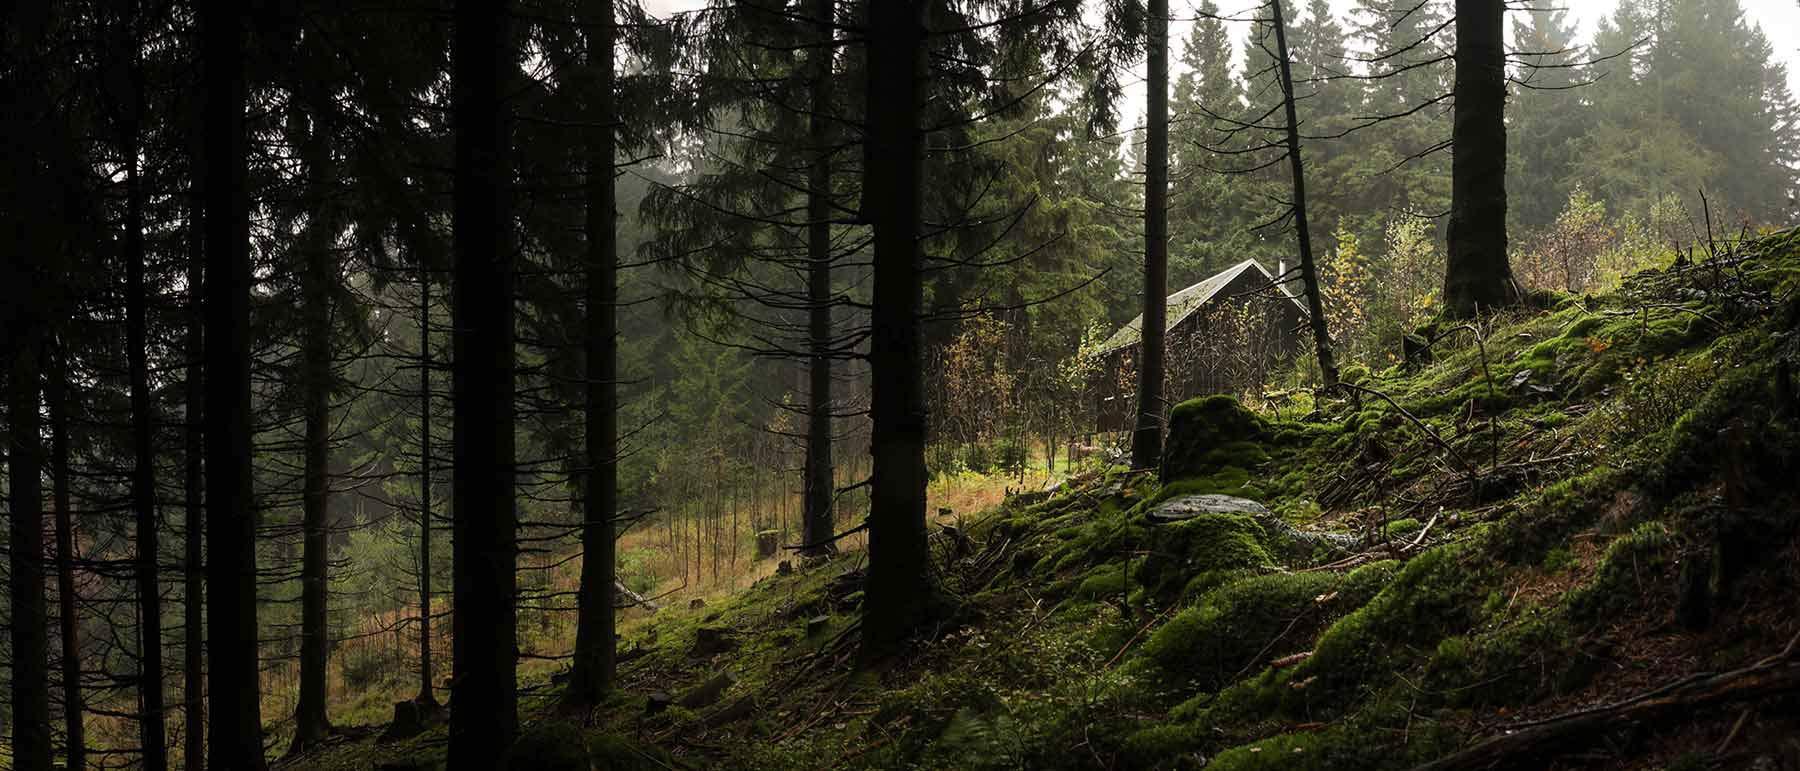 Waldhütte - Rohholz Plant Trees